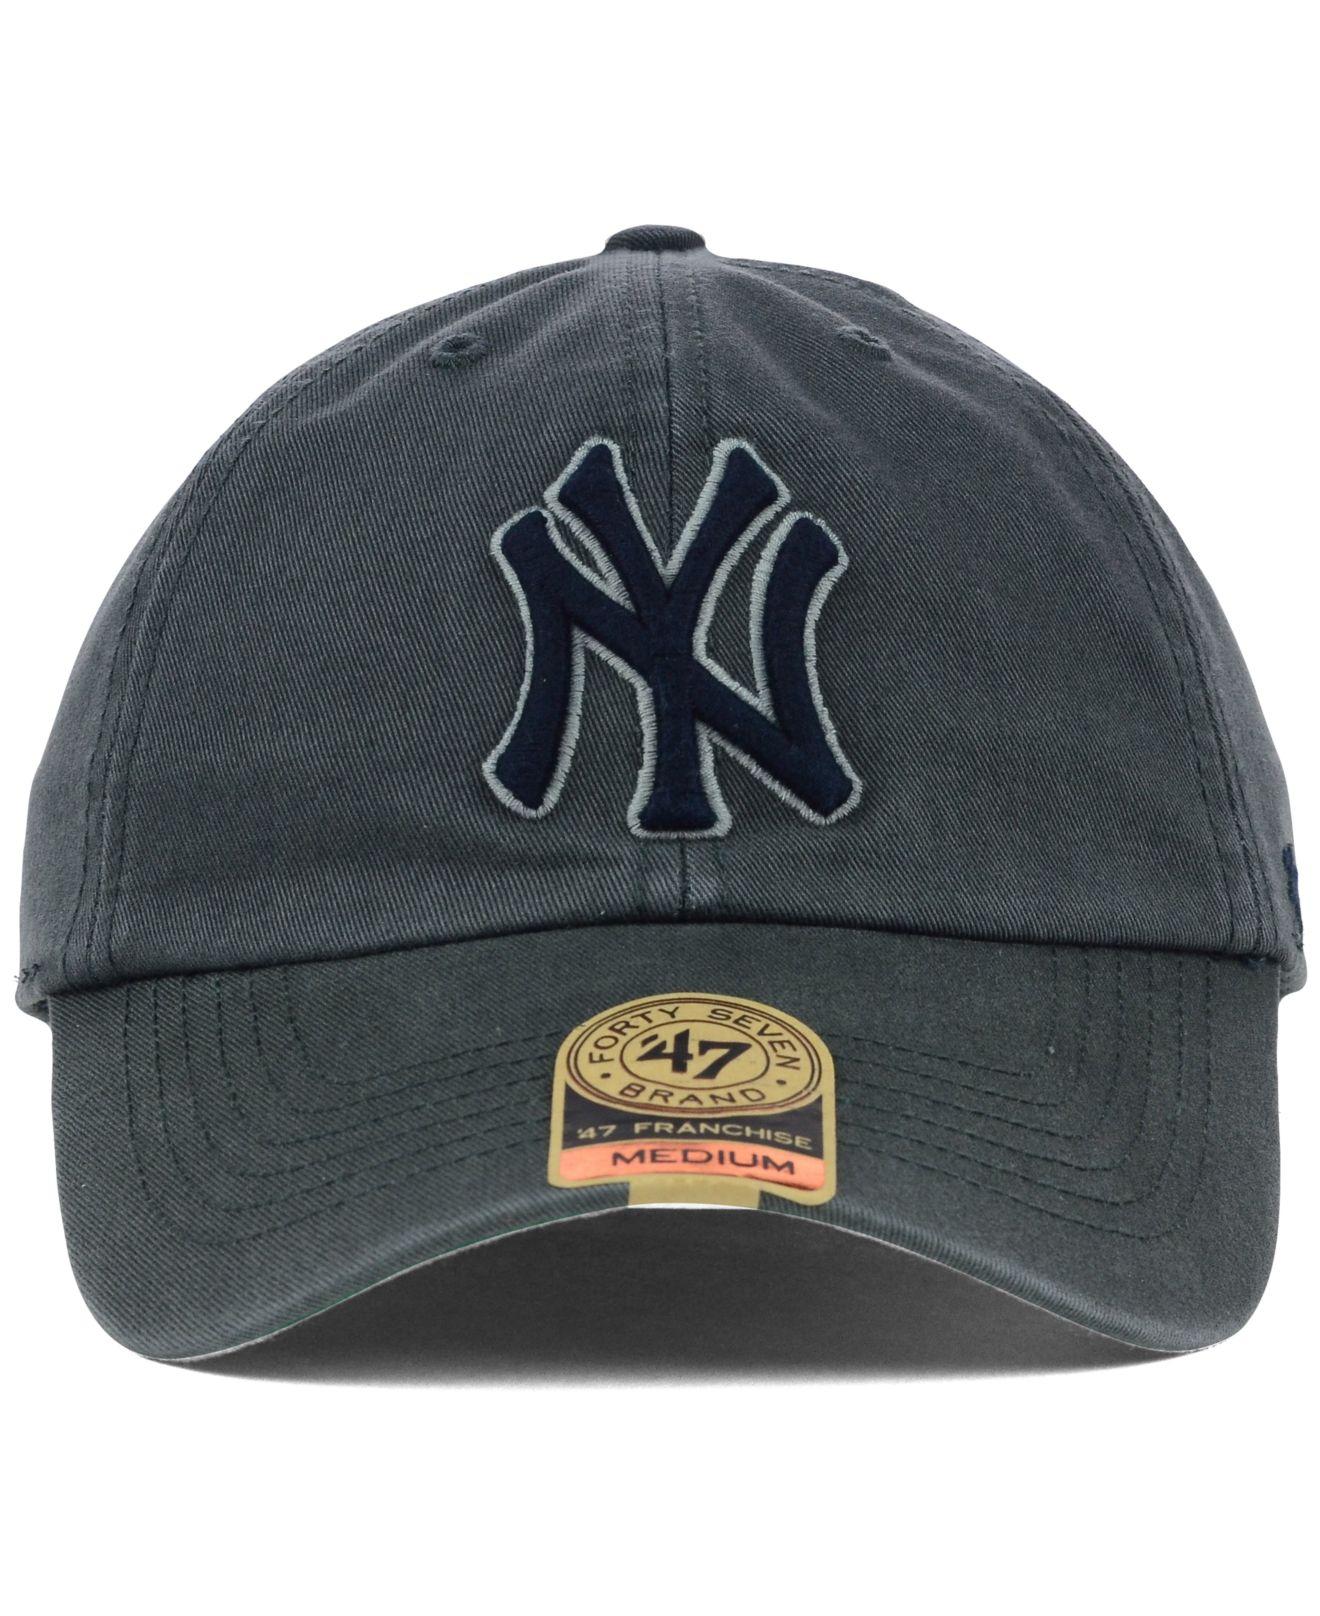 brand new 9c98d 33e5c ... uk macys new york yankees hat amazon 4c5ee 6151c canada new era mens  9forty new york yankees clean a frame trucker cap black white ...